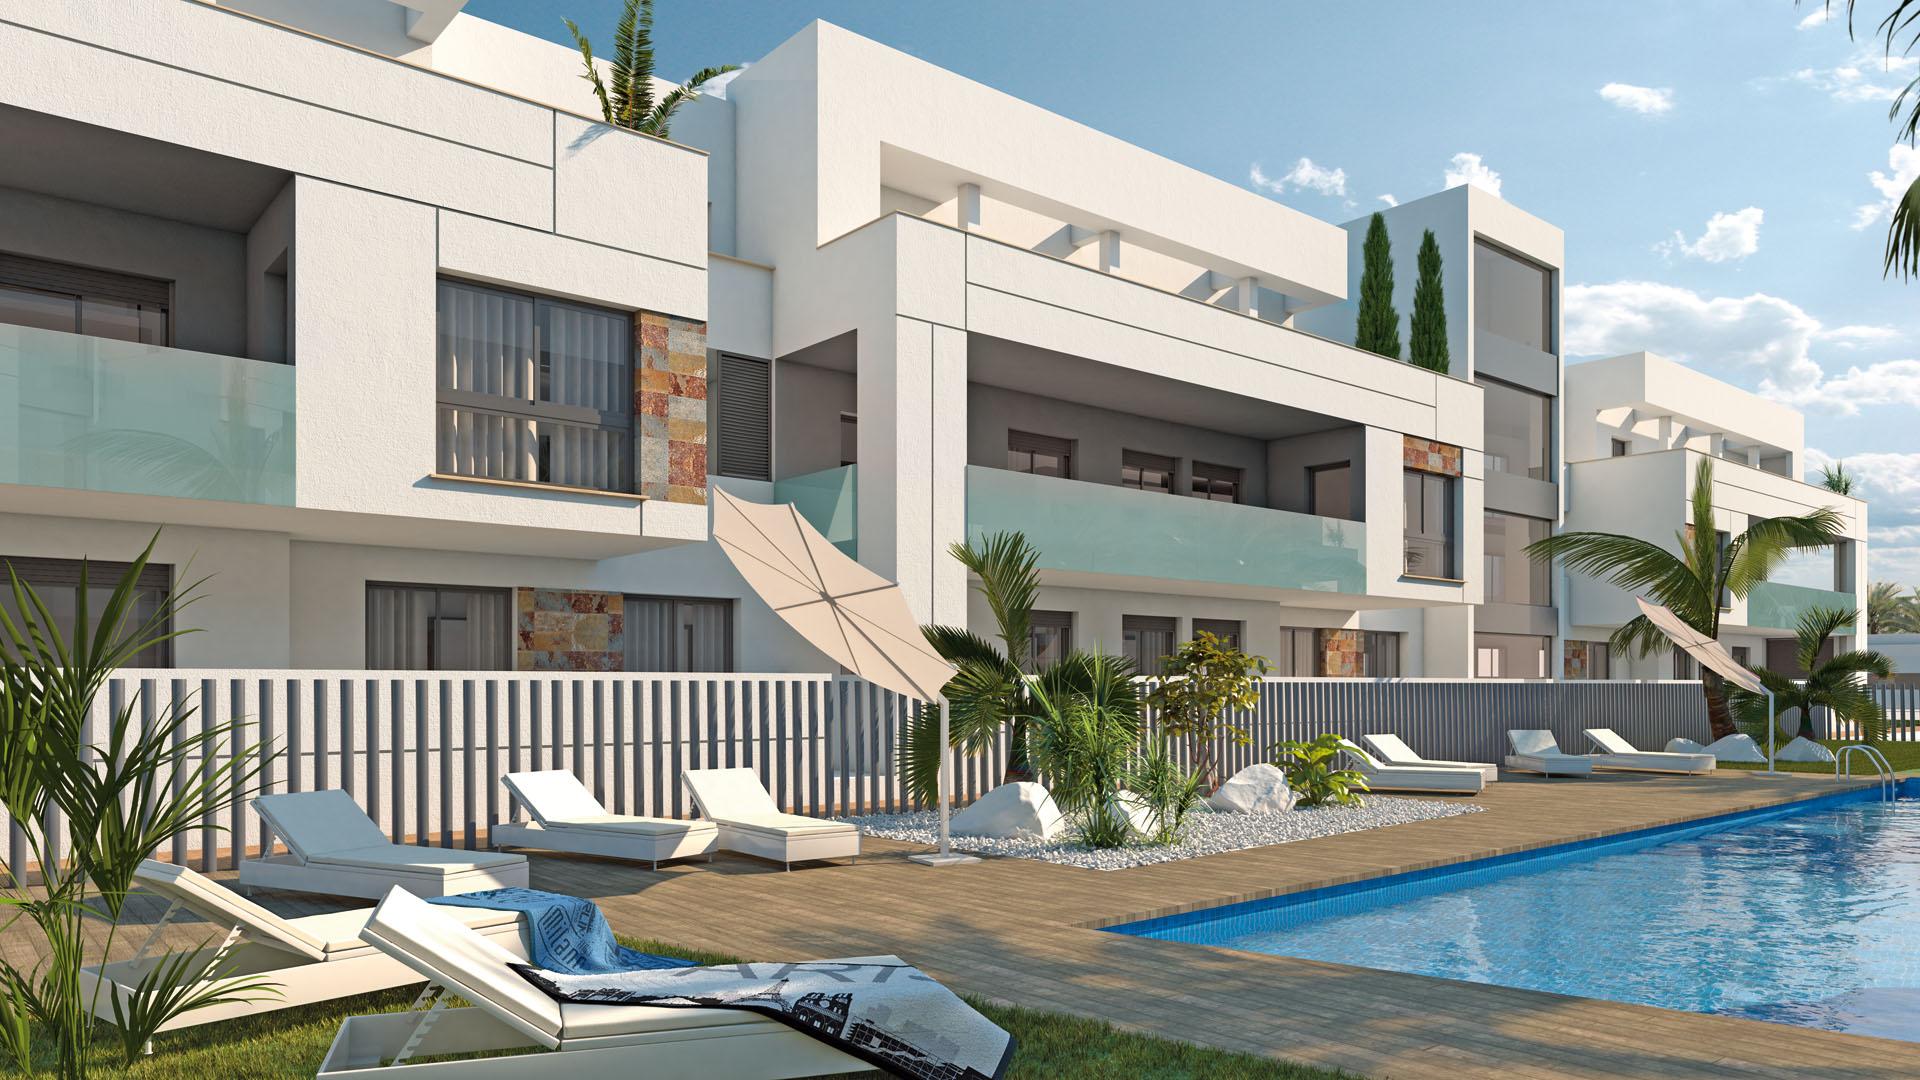 Inmobiliaria Baturone